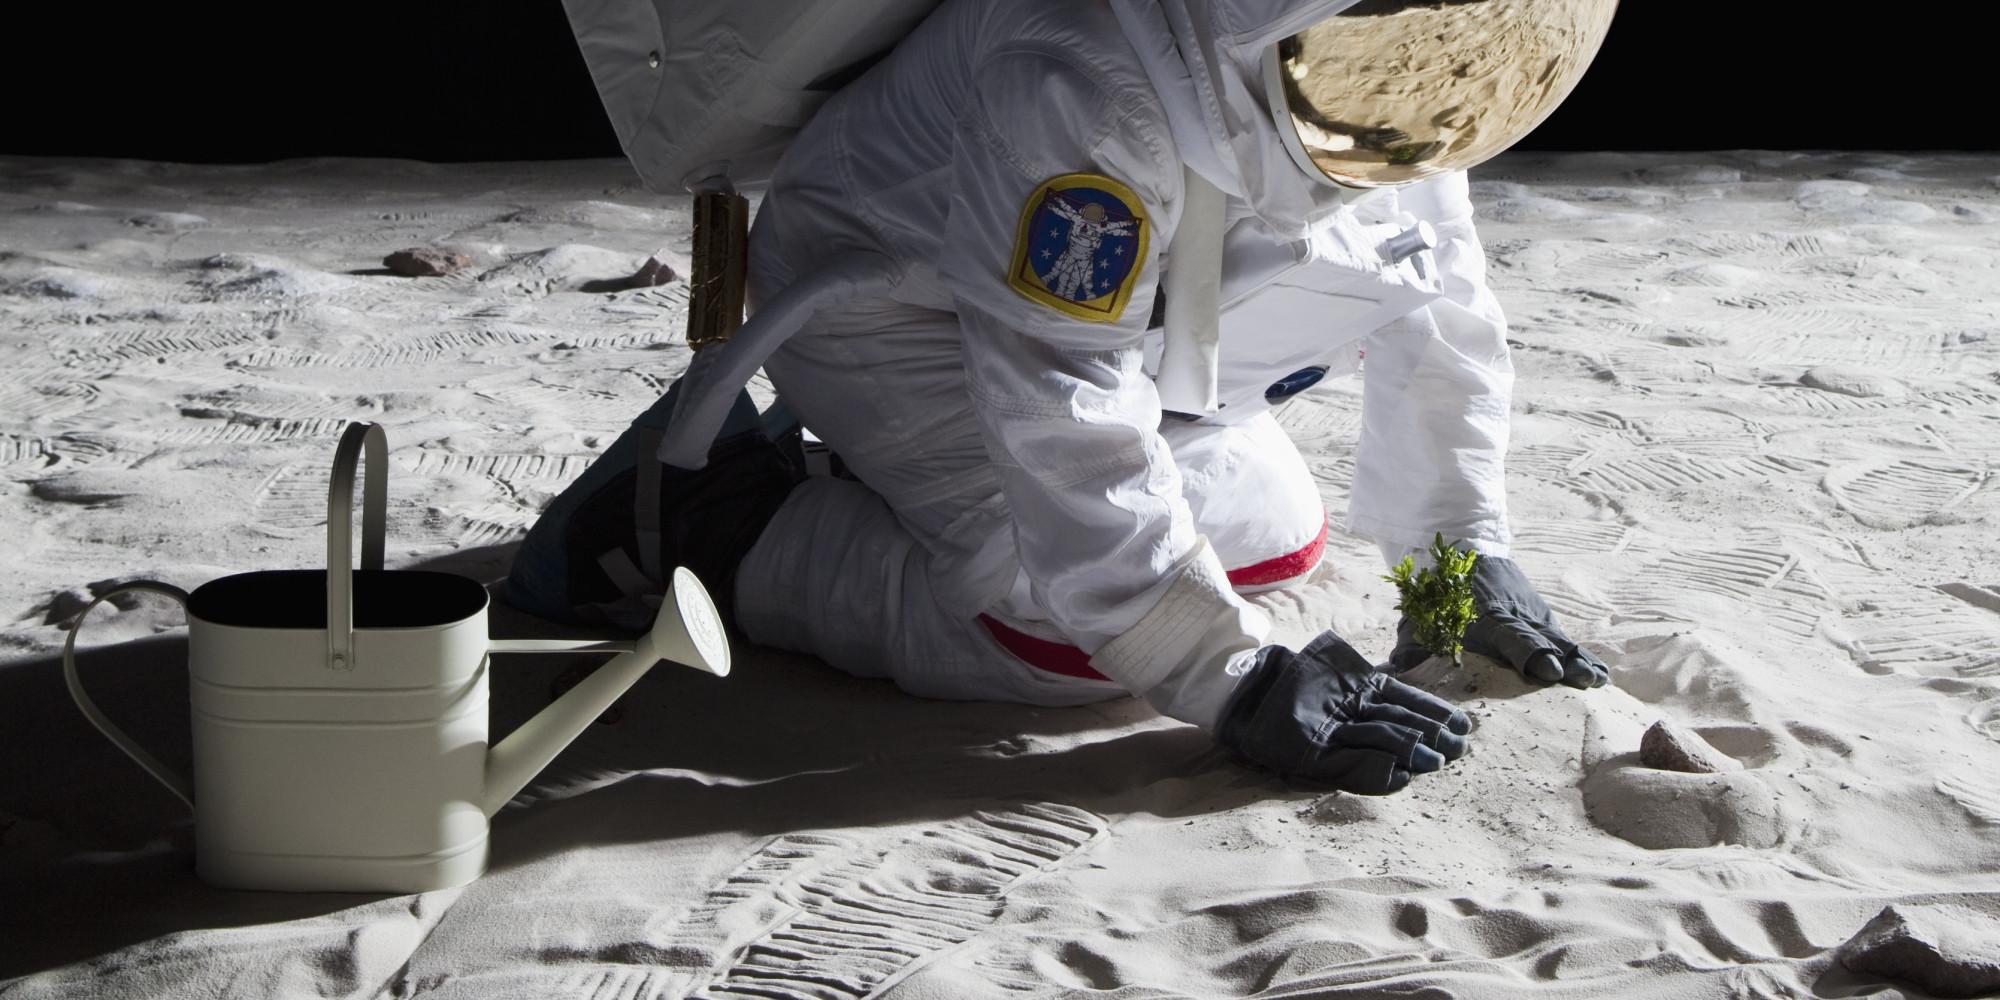 An astronaut gardening on the moon